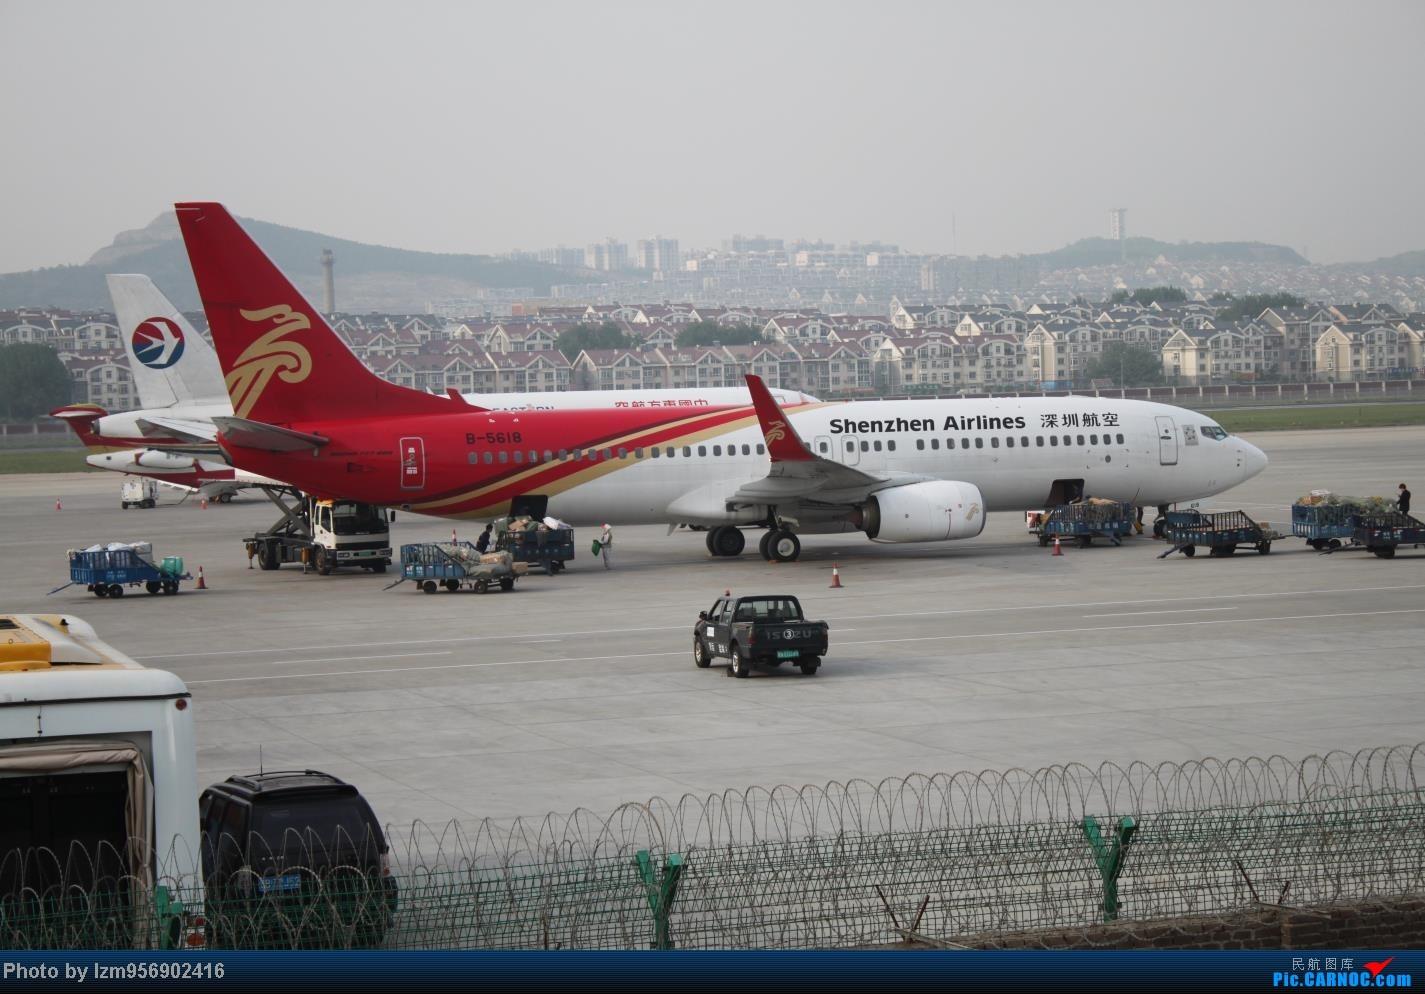 Re:[原创]DLC蹲点大半天,拍到了大棒航空772=w= BOEING 737-800 B-5618 中国大连周水子机场